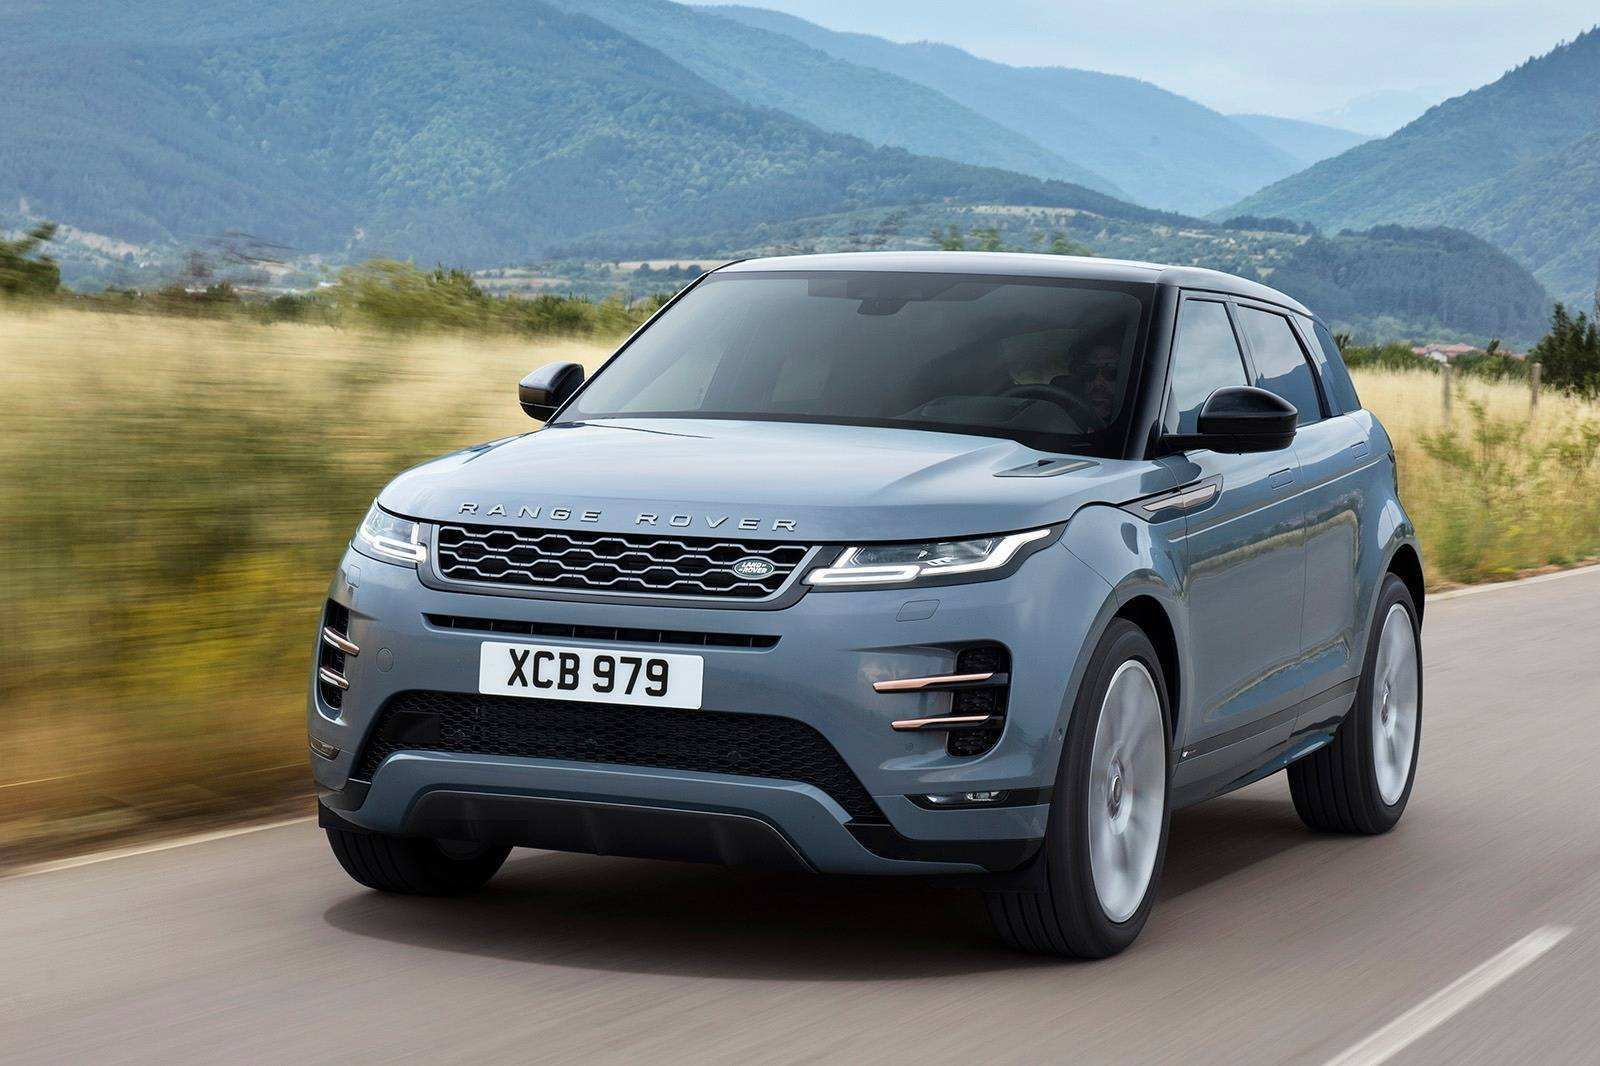 61 All New 2020 Range Rover Evoque Wallpaper by 2020 Range Rover Evoque